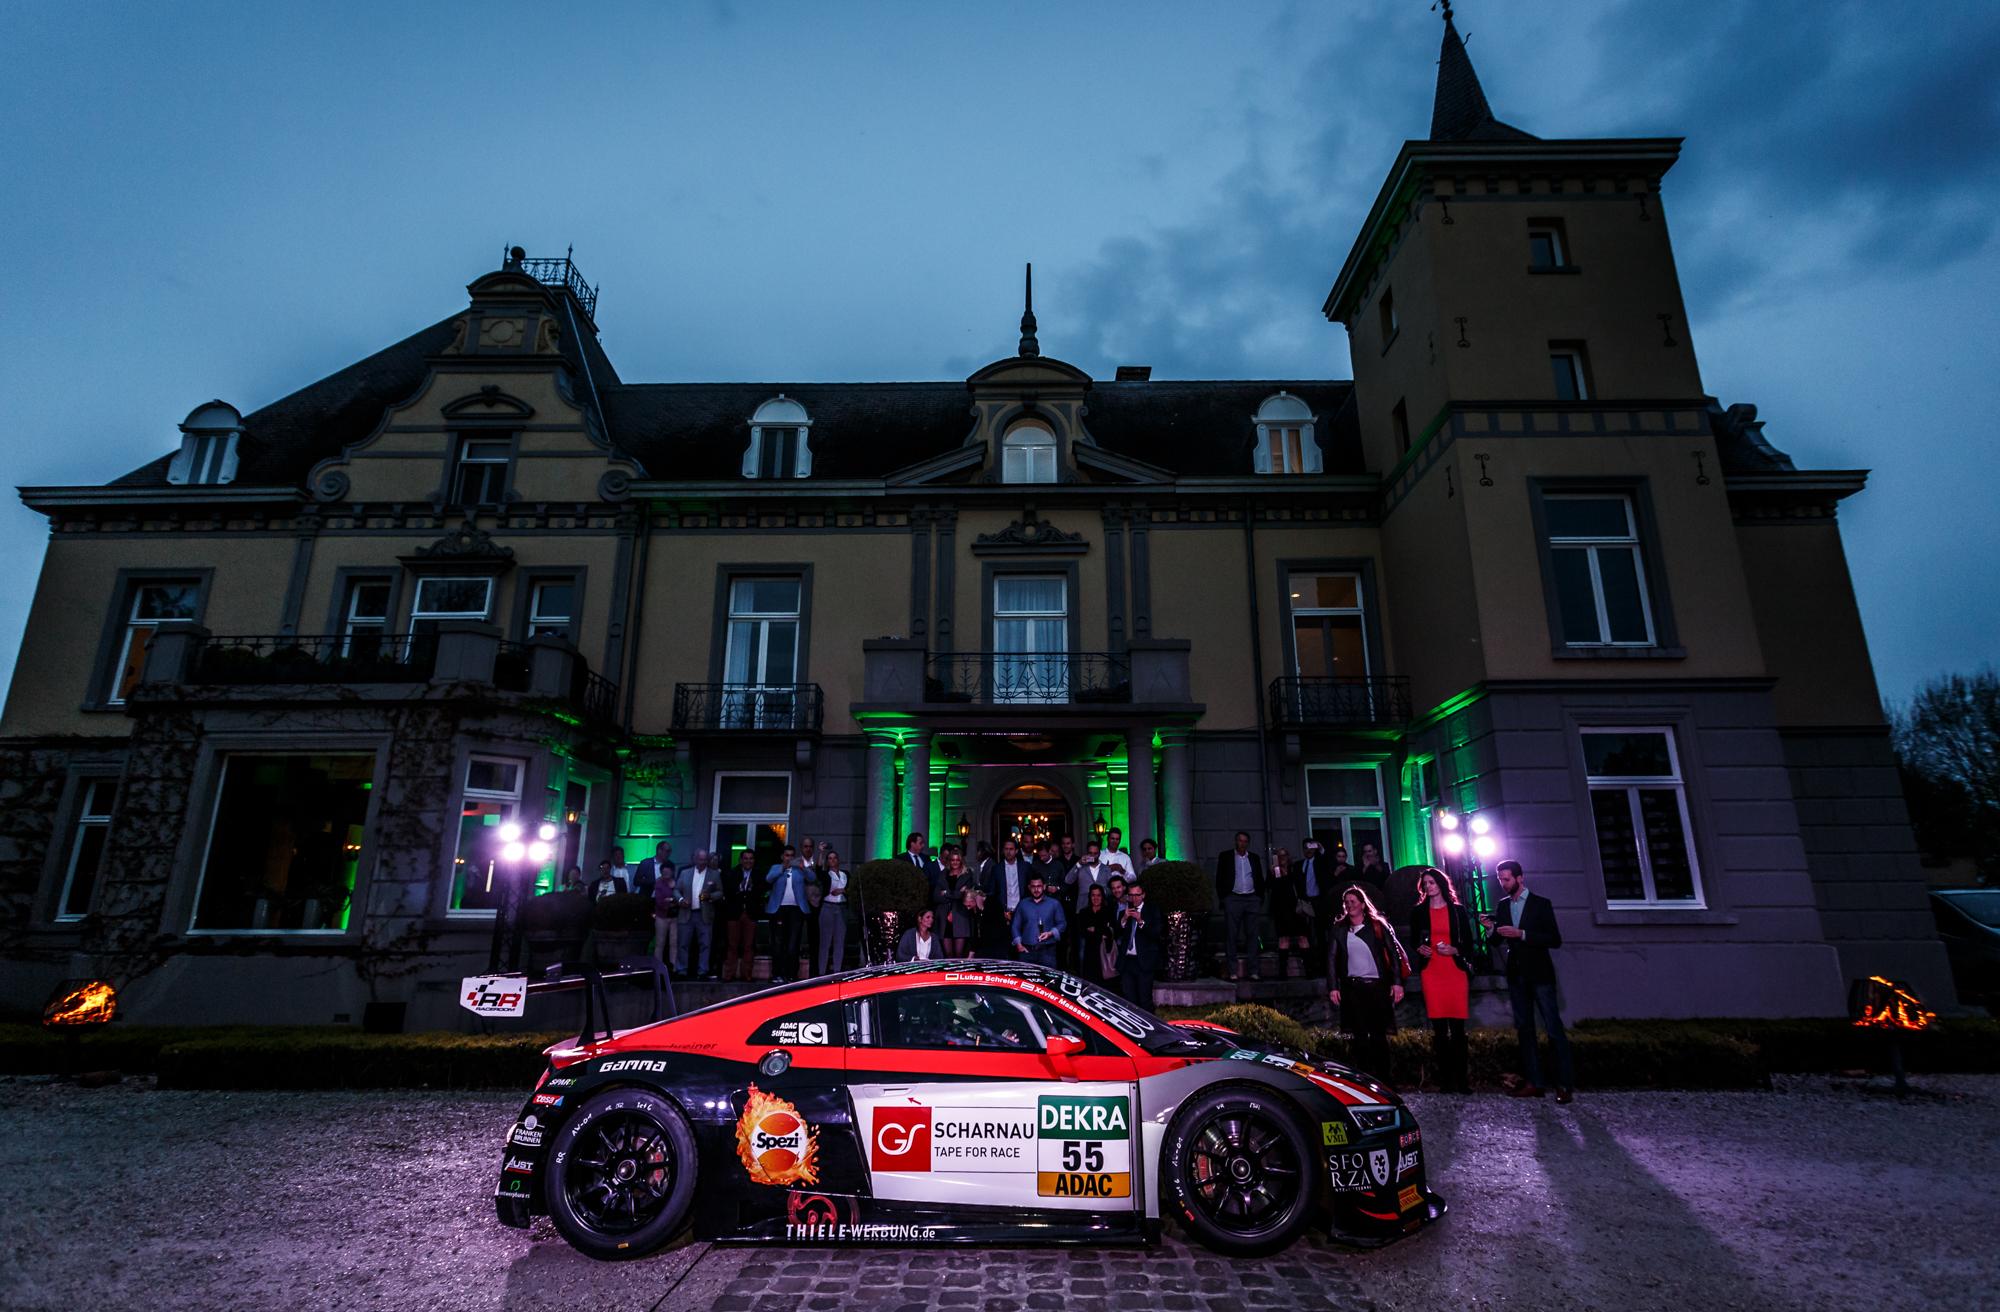 Veelbelovende start in ADAC GT Masters